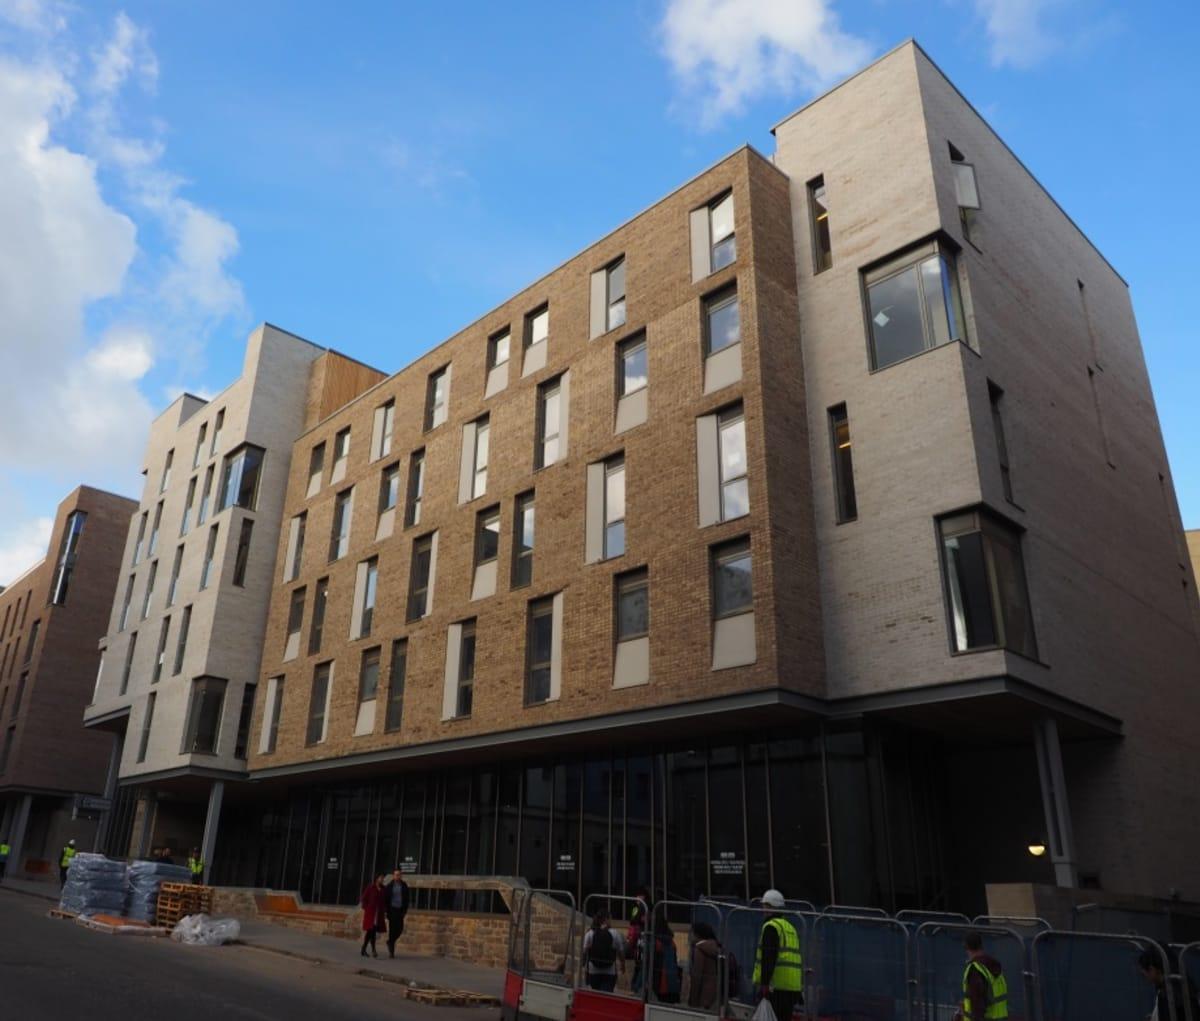 Student accommodation created using facing bricks